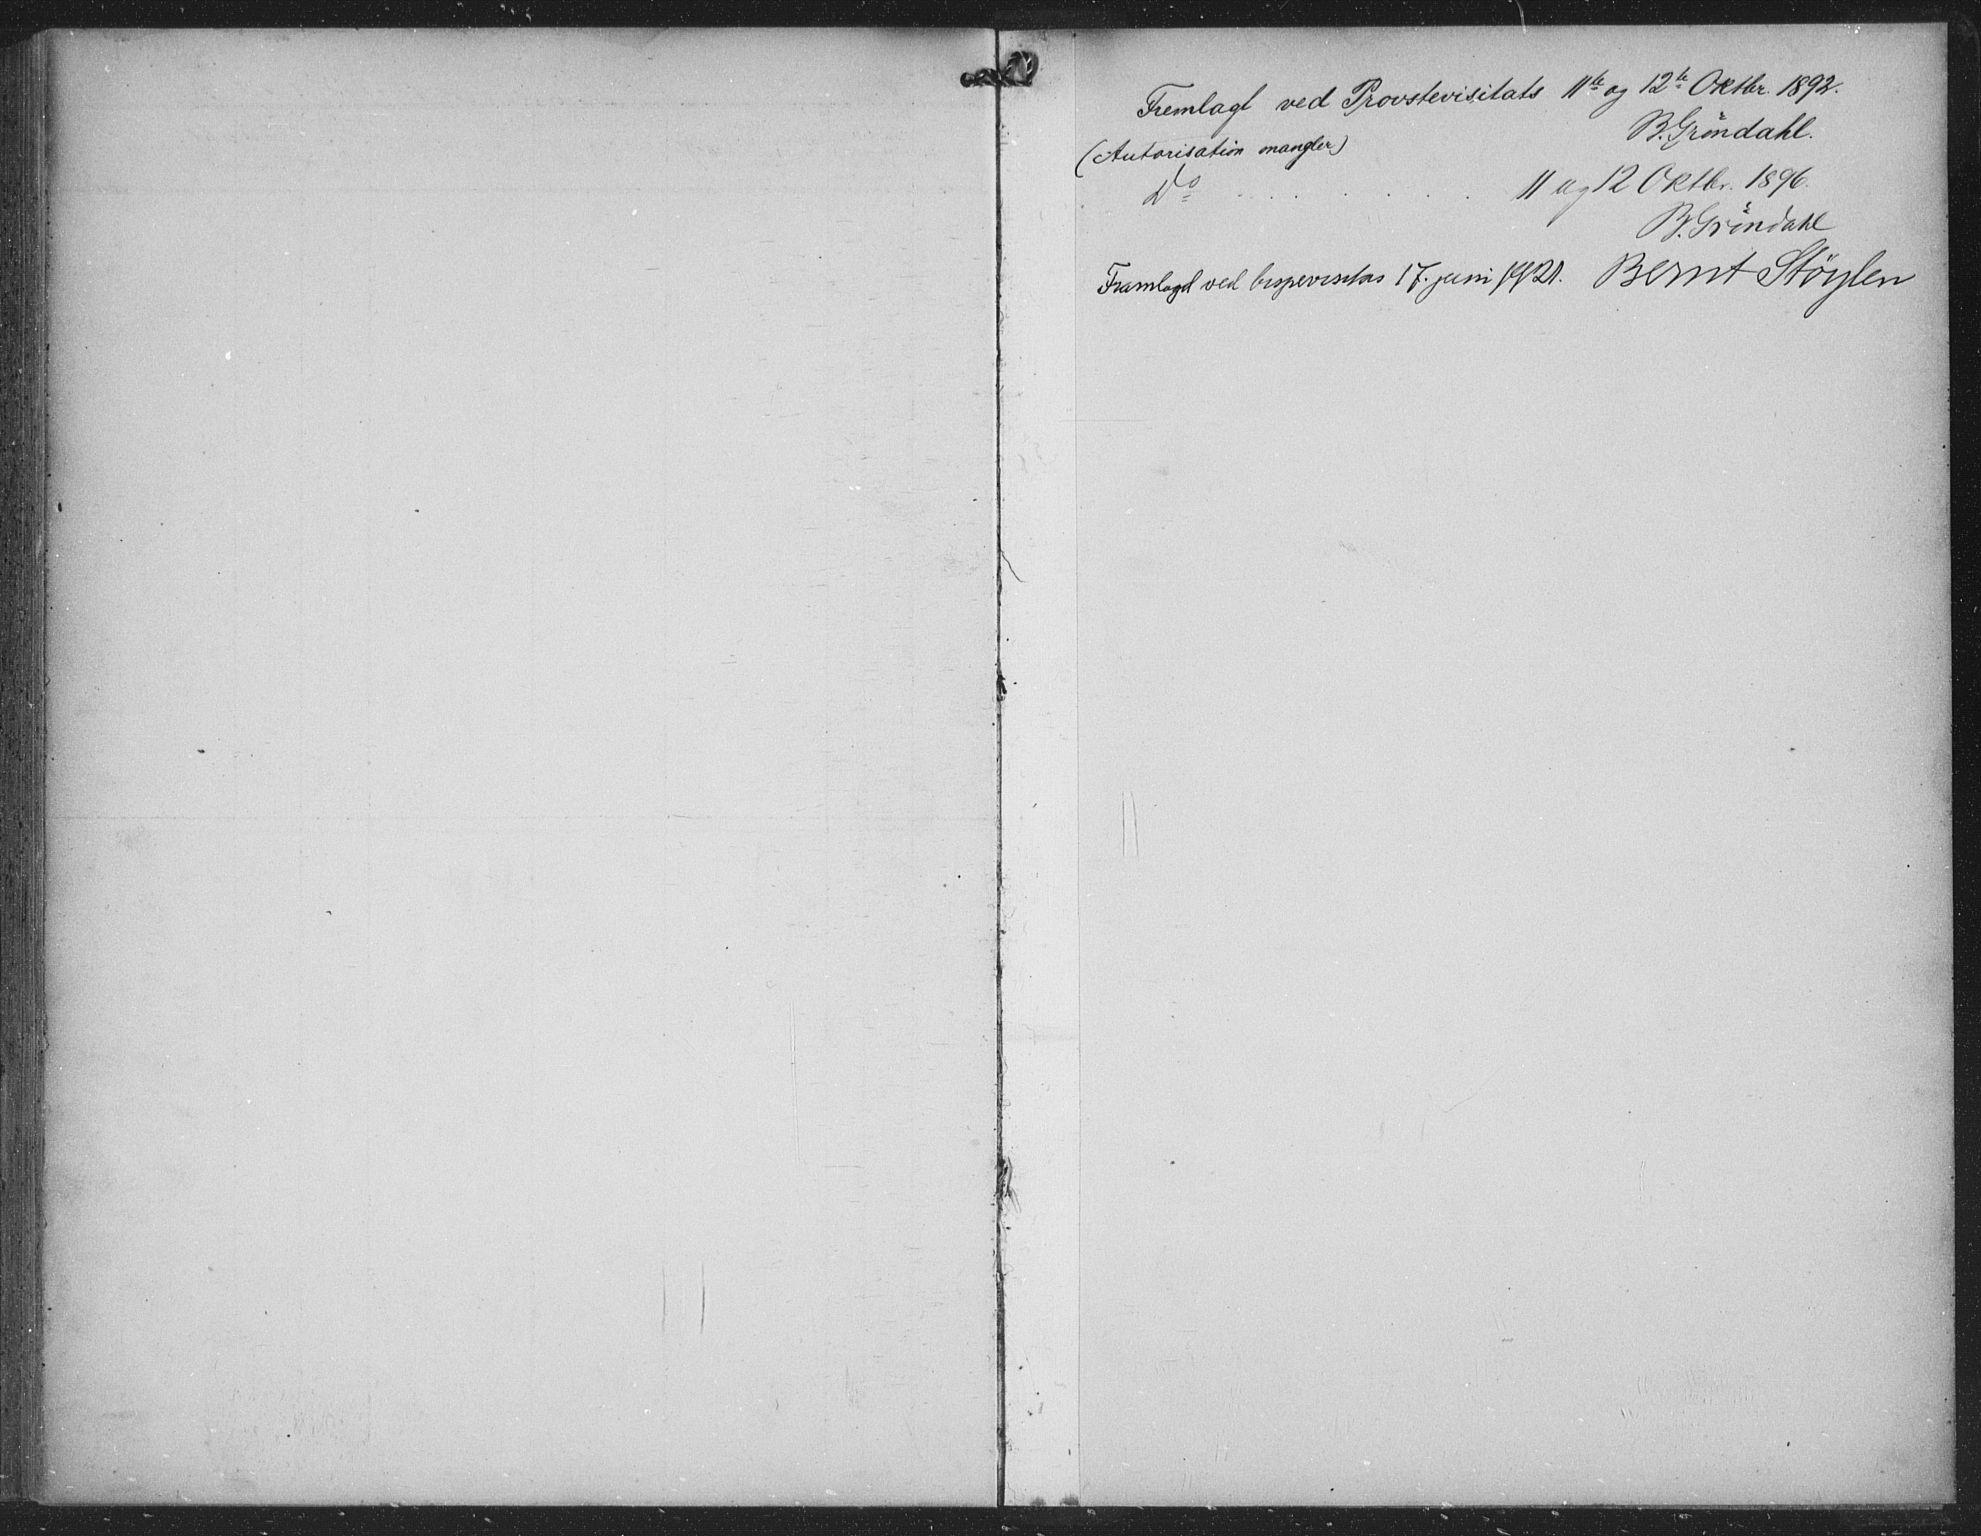 SAKO, Seljord kirkebøker, G/Gc/L0003: Klokkerbok nr. III 3, 1887-1926